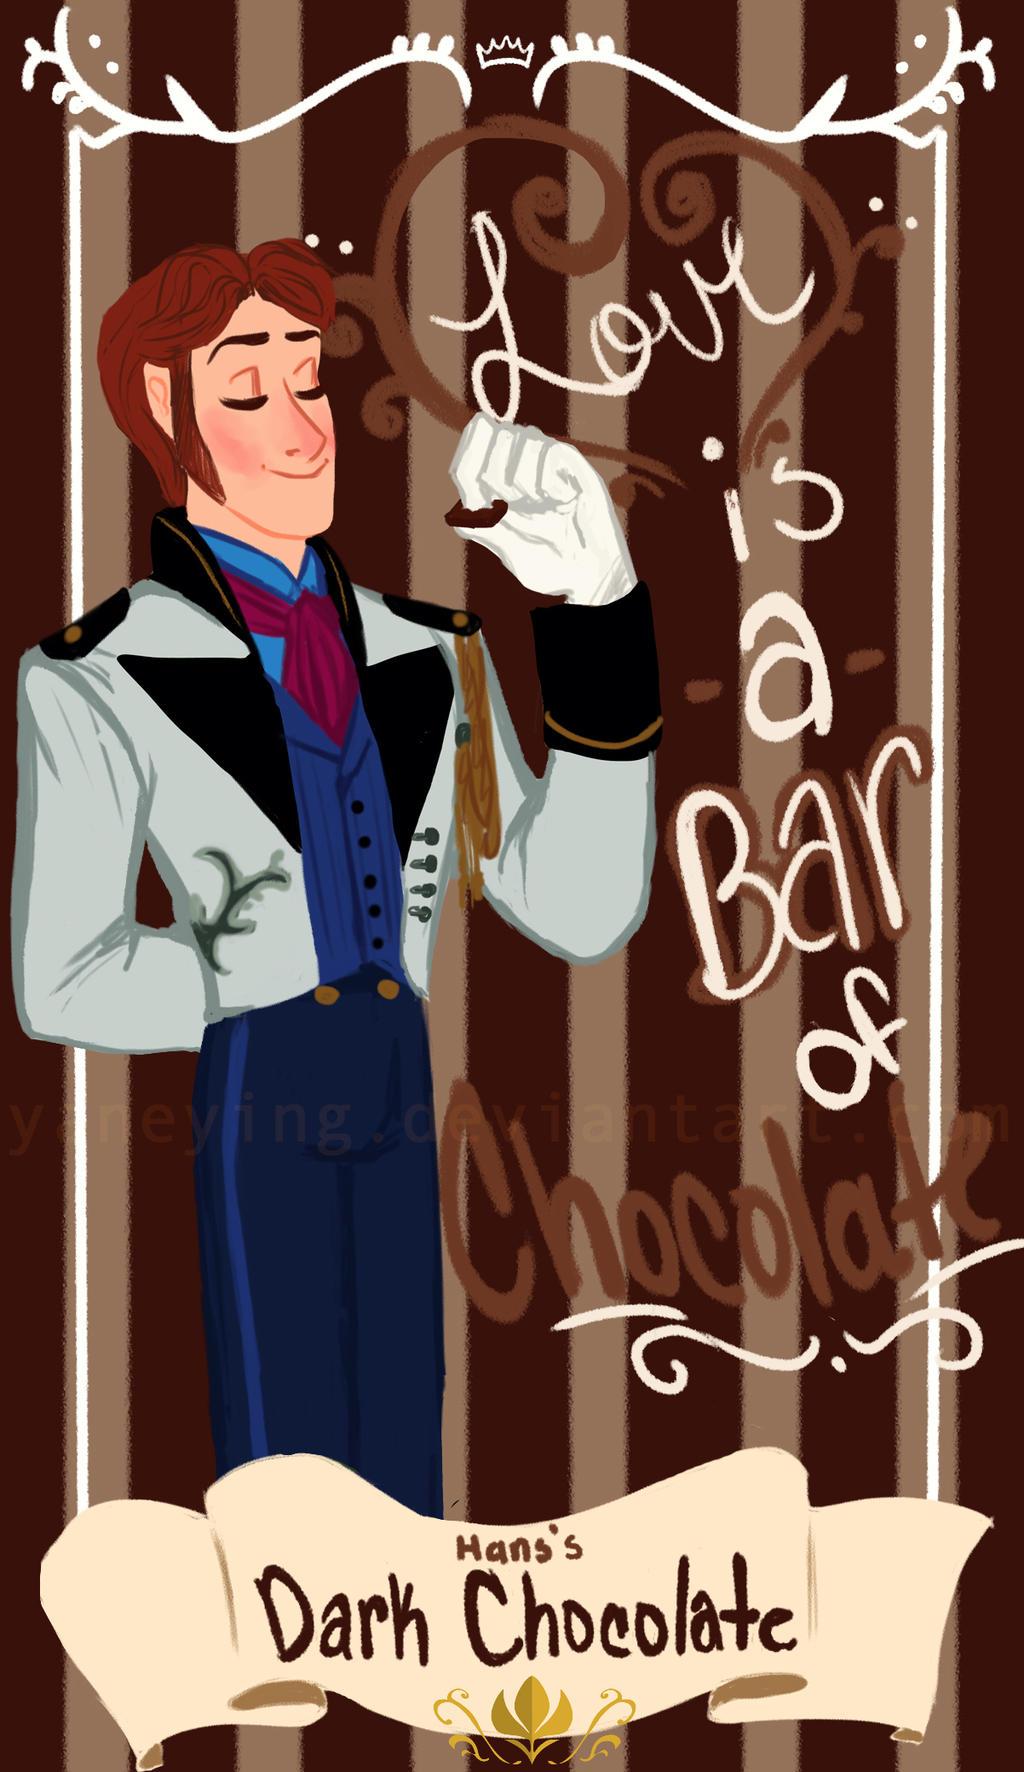 Hans' Dark Chocolate